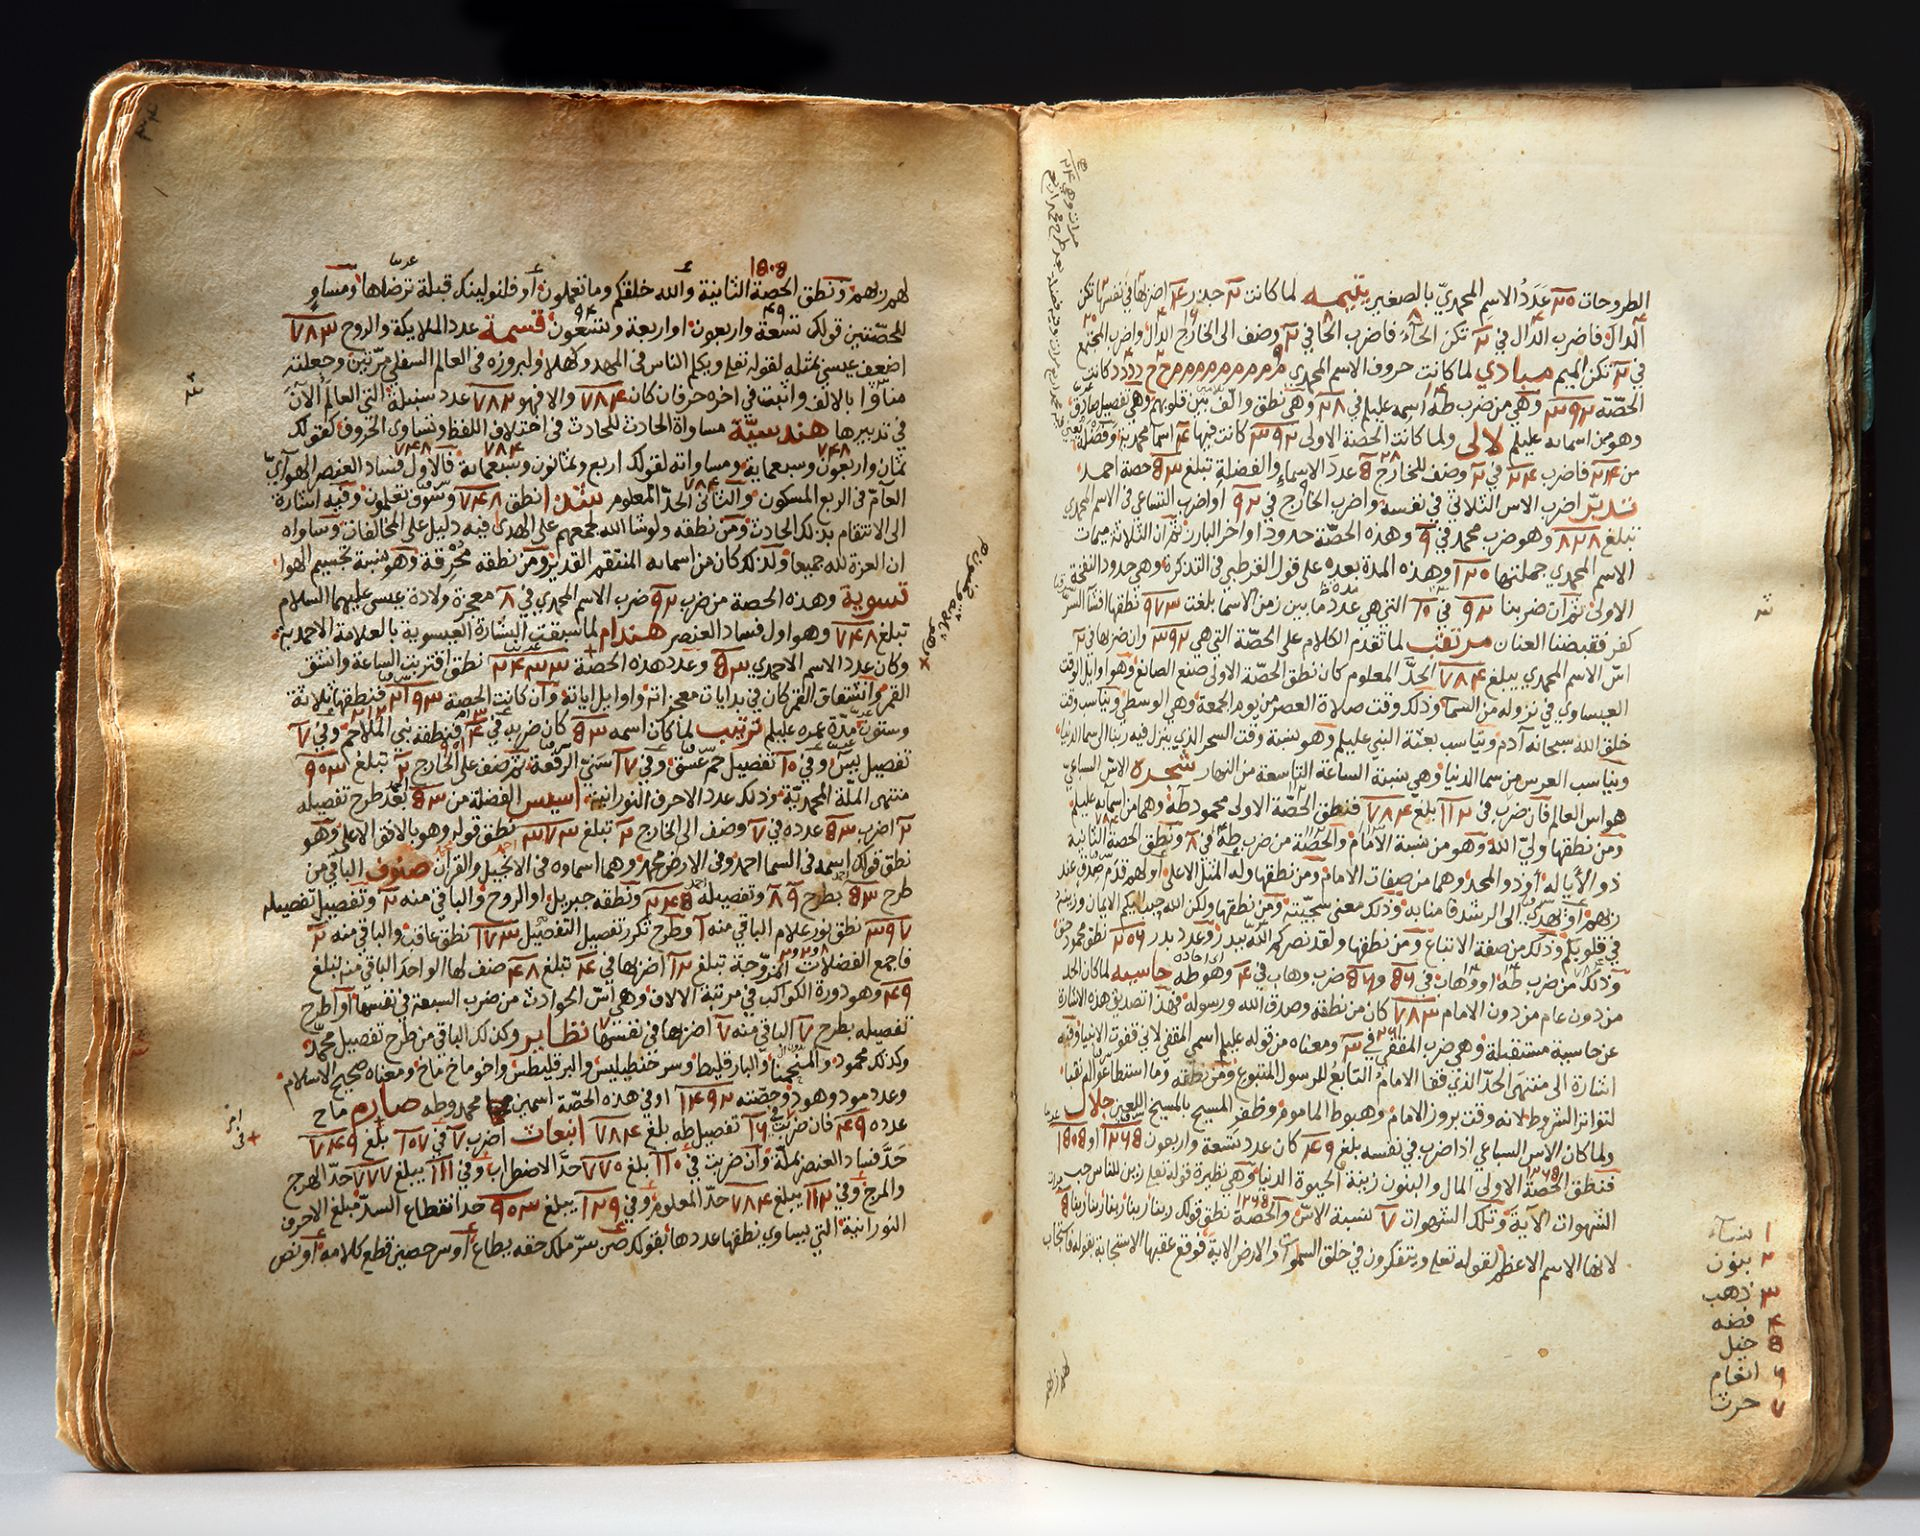 TAWIL AL'IASHARH W ATMATHIL ALEIBARIH - Bild 3 aus 4